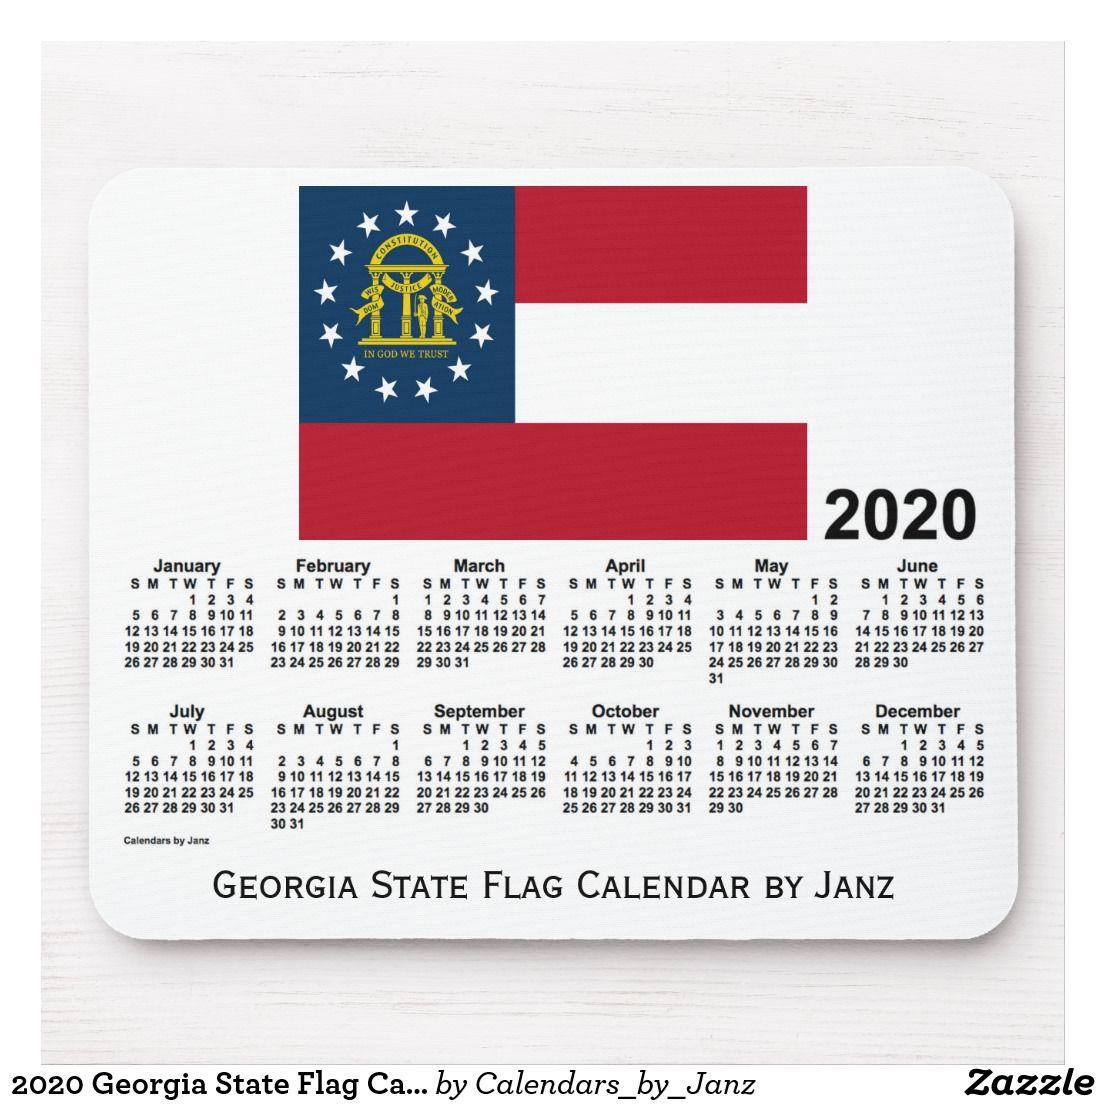 Georgia State Summer Classes 2020.2020 Calendar By Janz Georgia State Flag Mouse Pad Zazzle